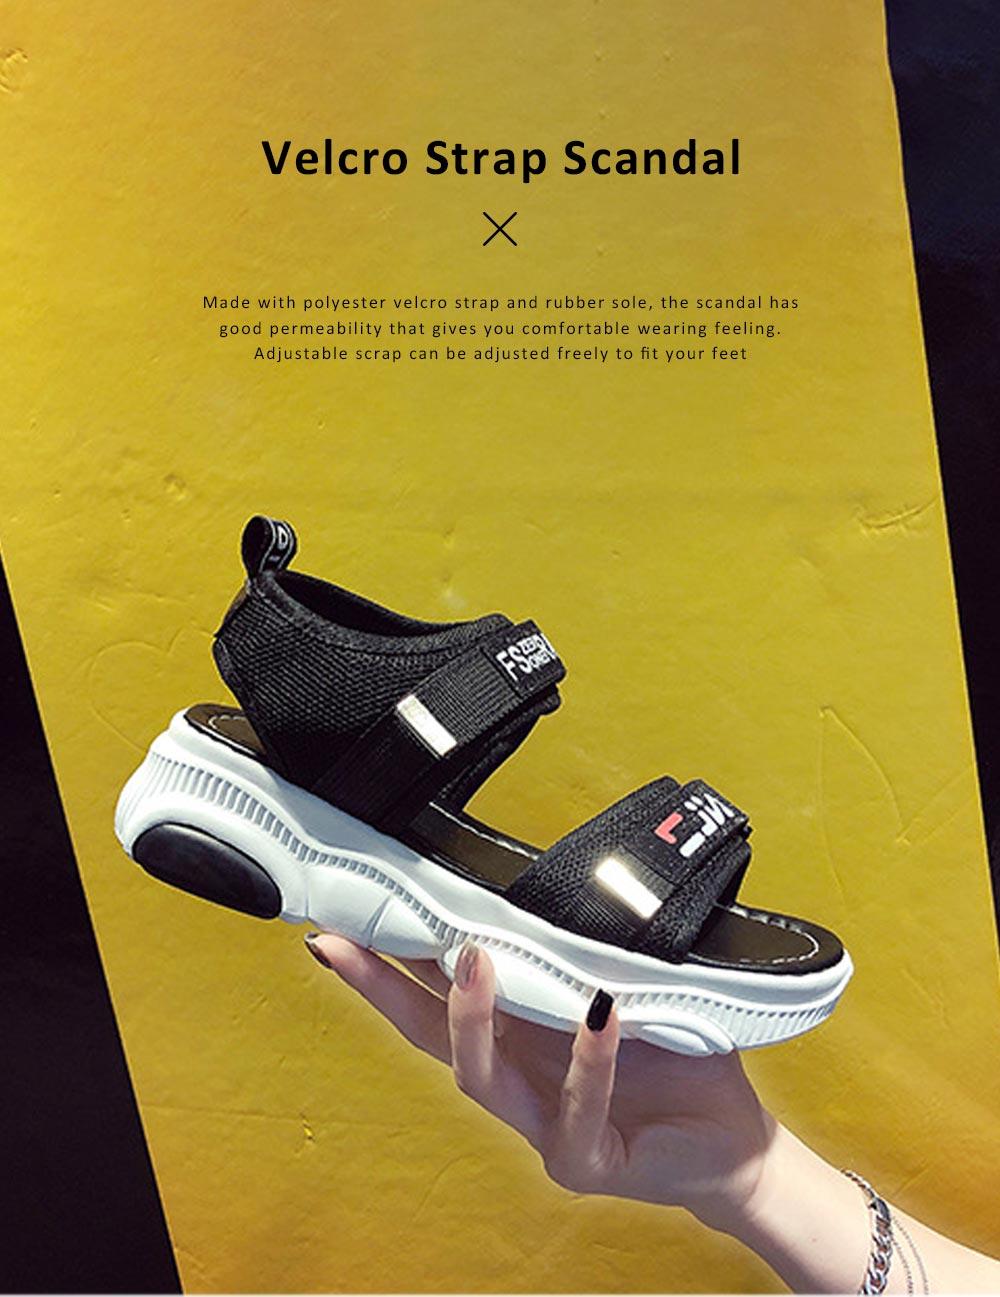 Women Scandal Elastic Adjustable Velcro Strap Shoe Breathable Athletic Open Toe Shoe Bear Bottom for Walking Running 0